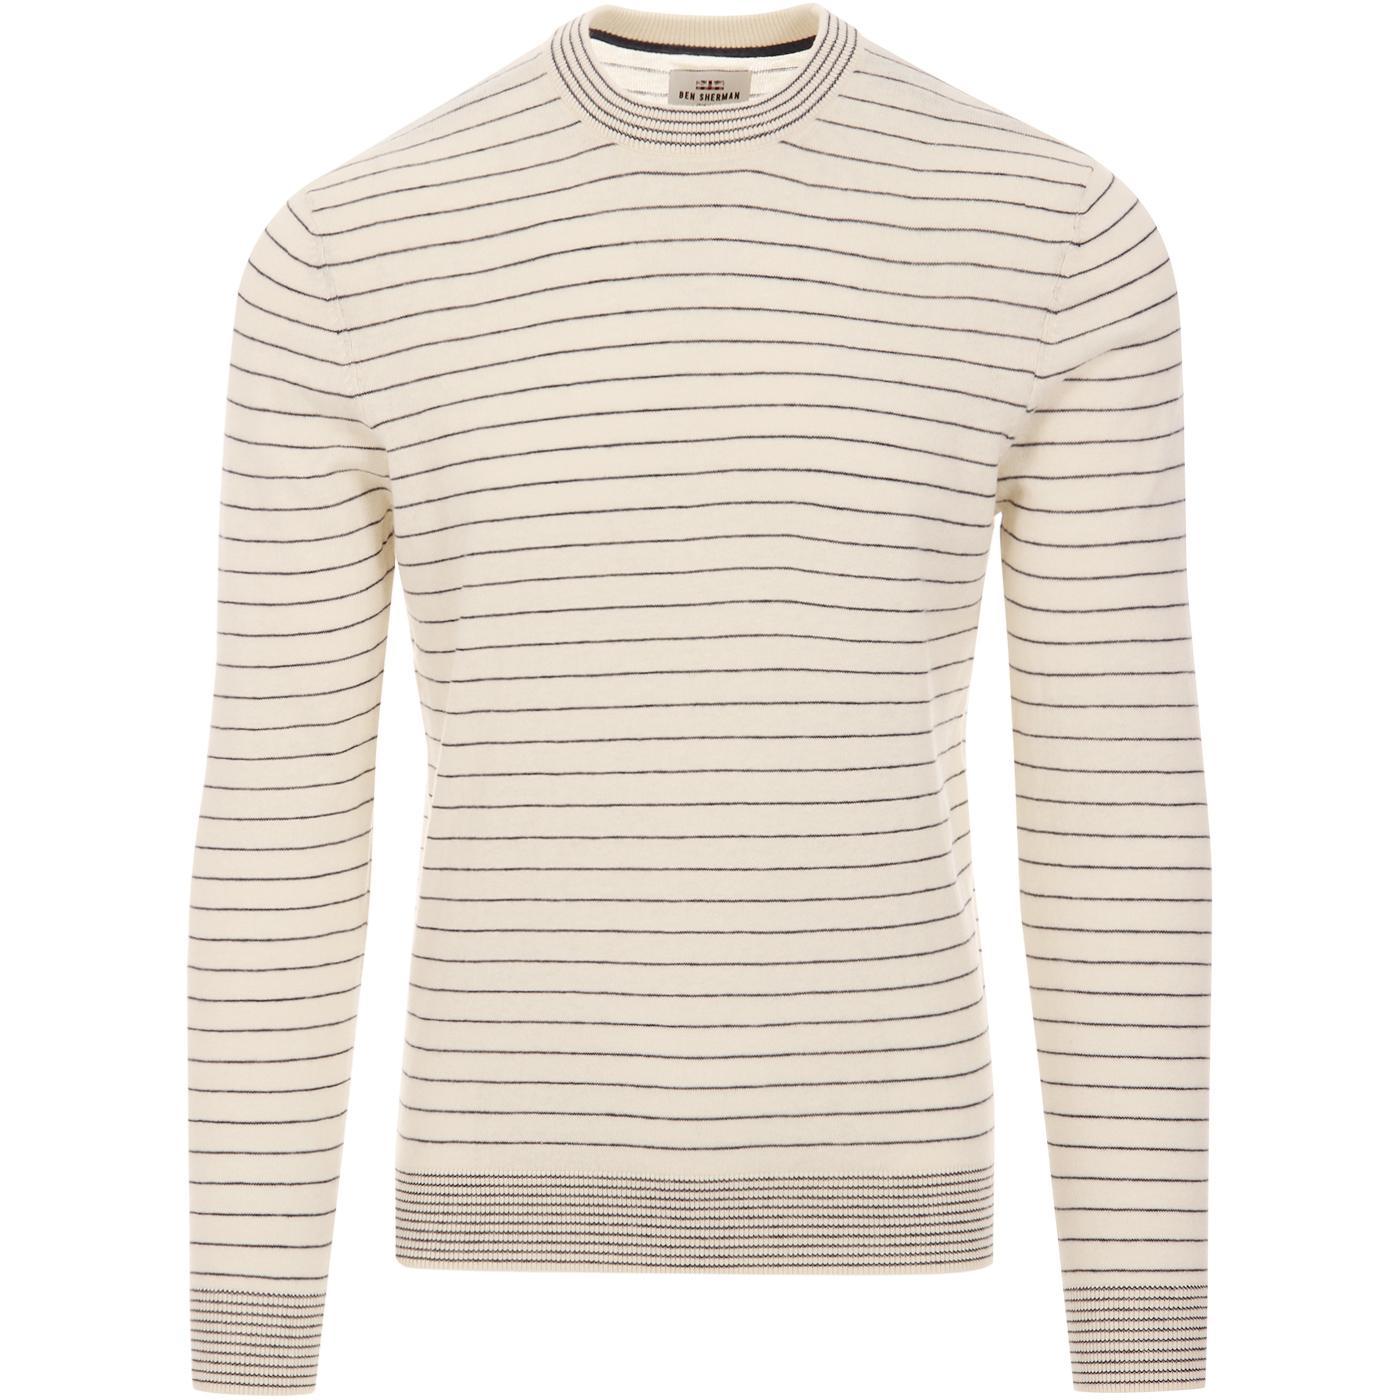 BEN SHERMAN Retro Mod Fine Stripe Knit Jumper (OW)